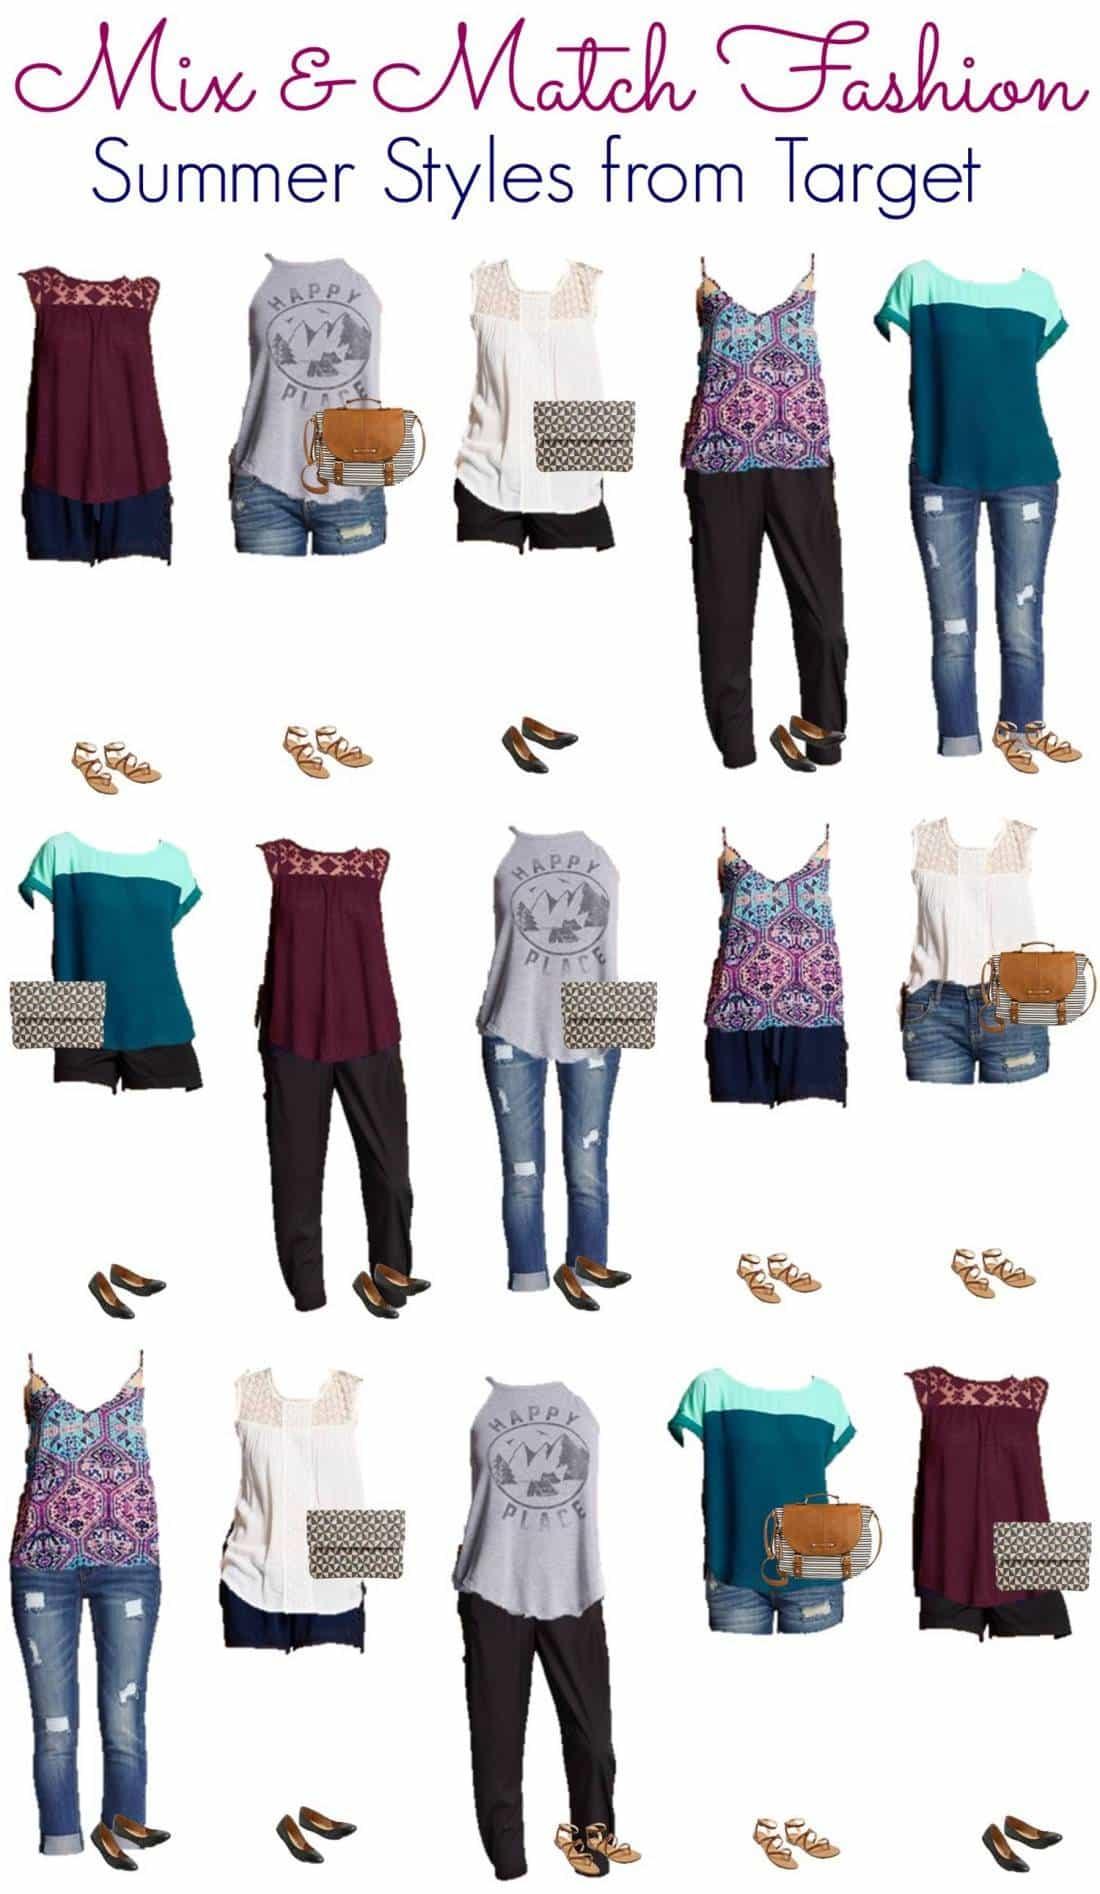 4.28 Mix & Match Fashion - Target Summer Styles VERTICAL